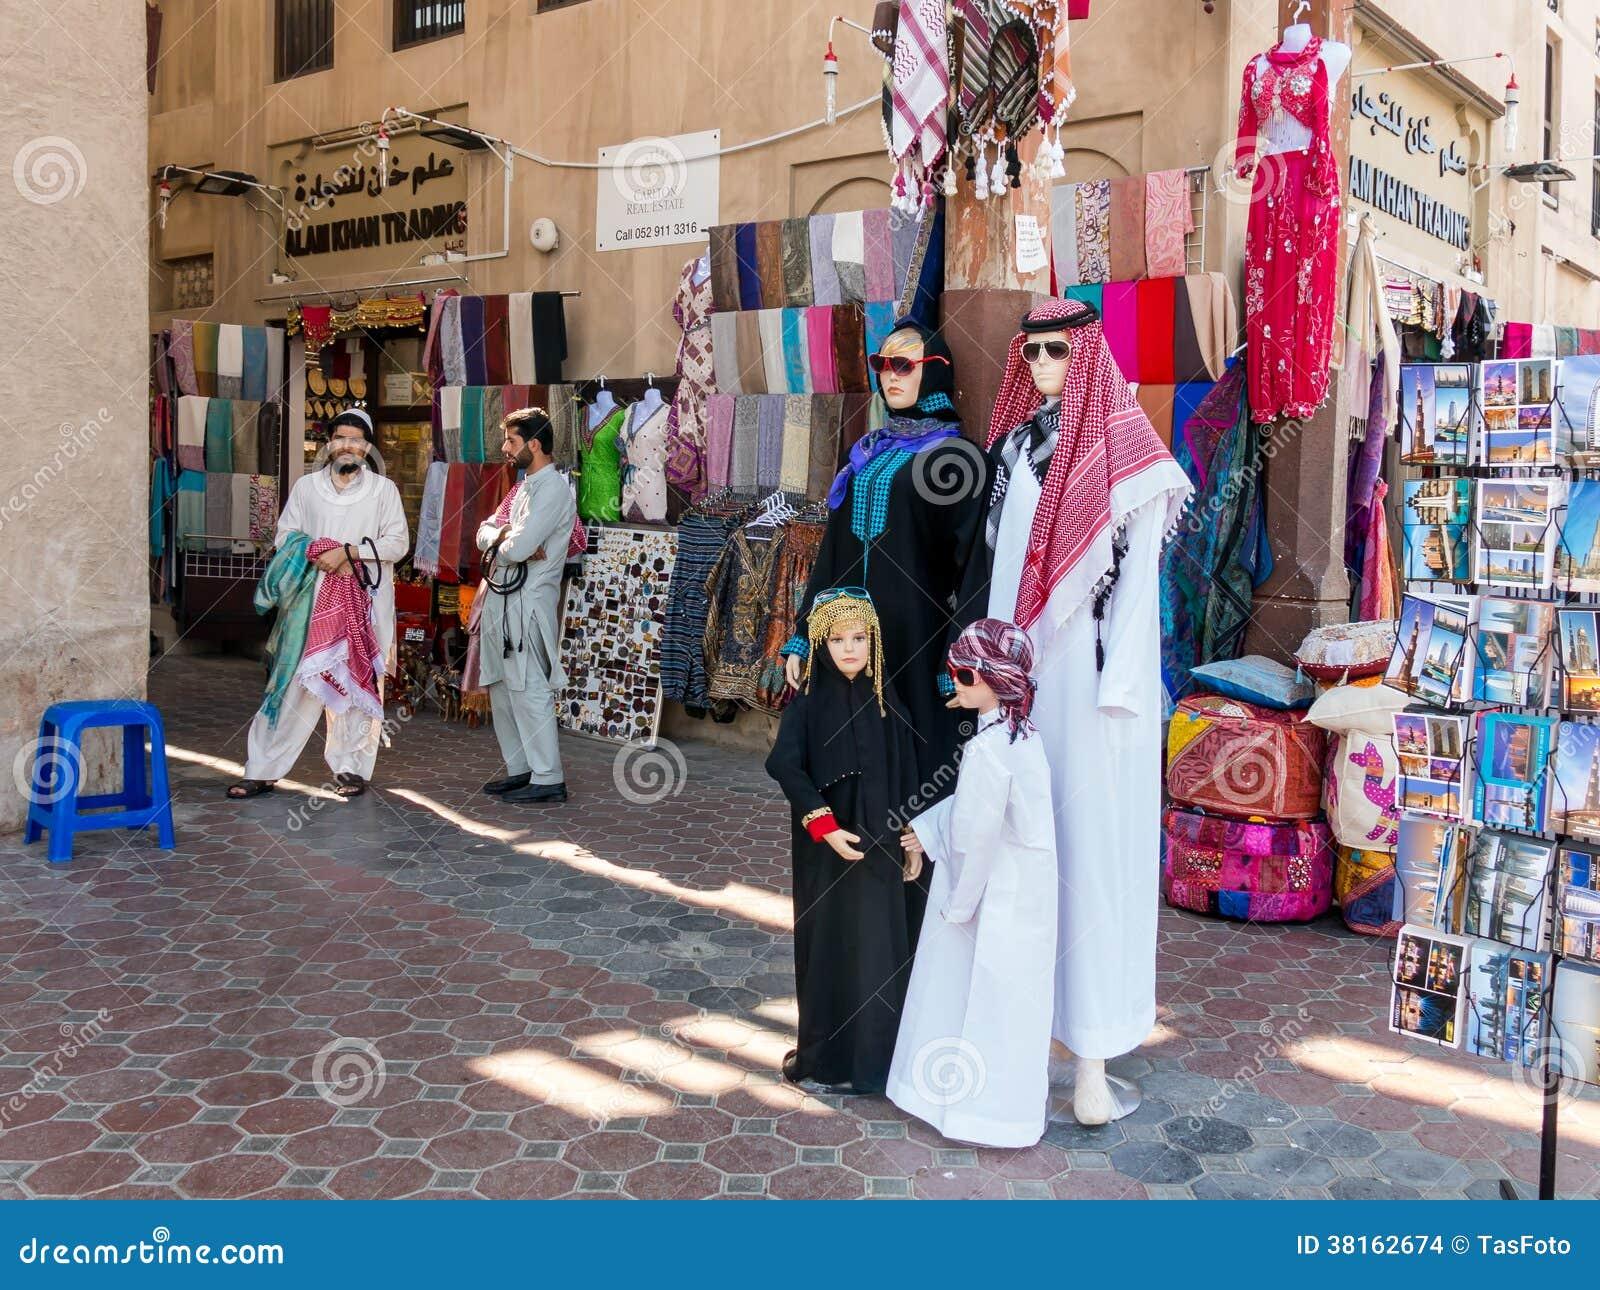 Shop In Textile Souk Bur Dubai In Dubai Editorial Stock